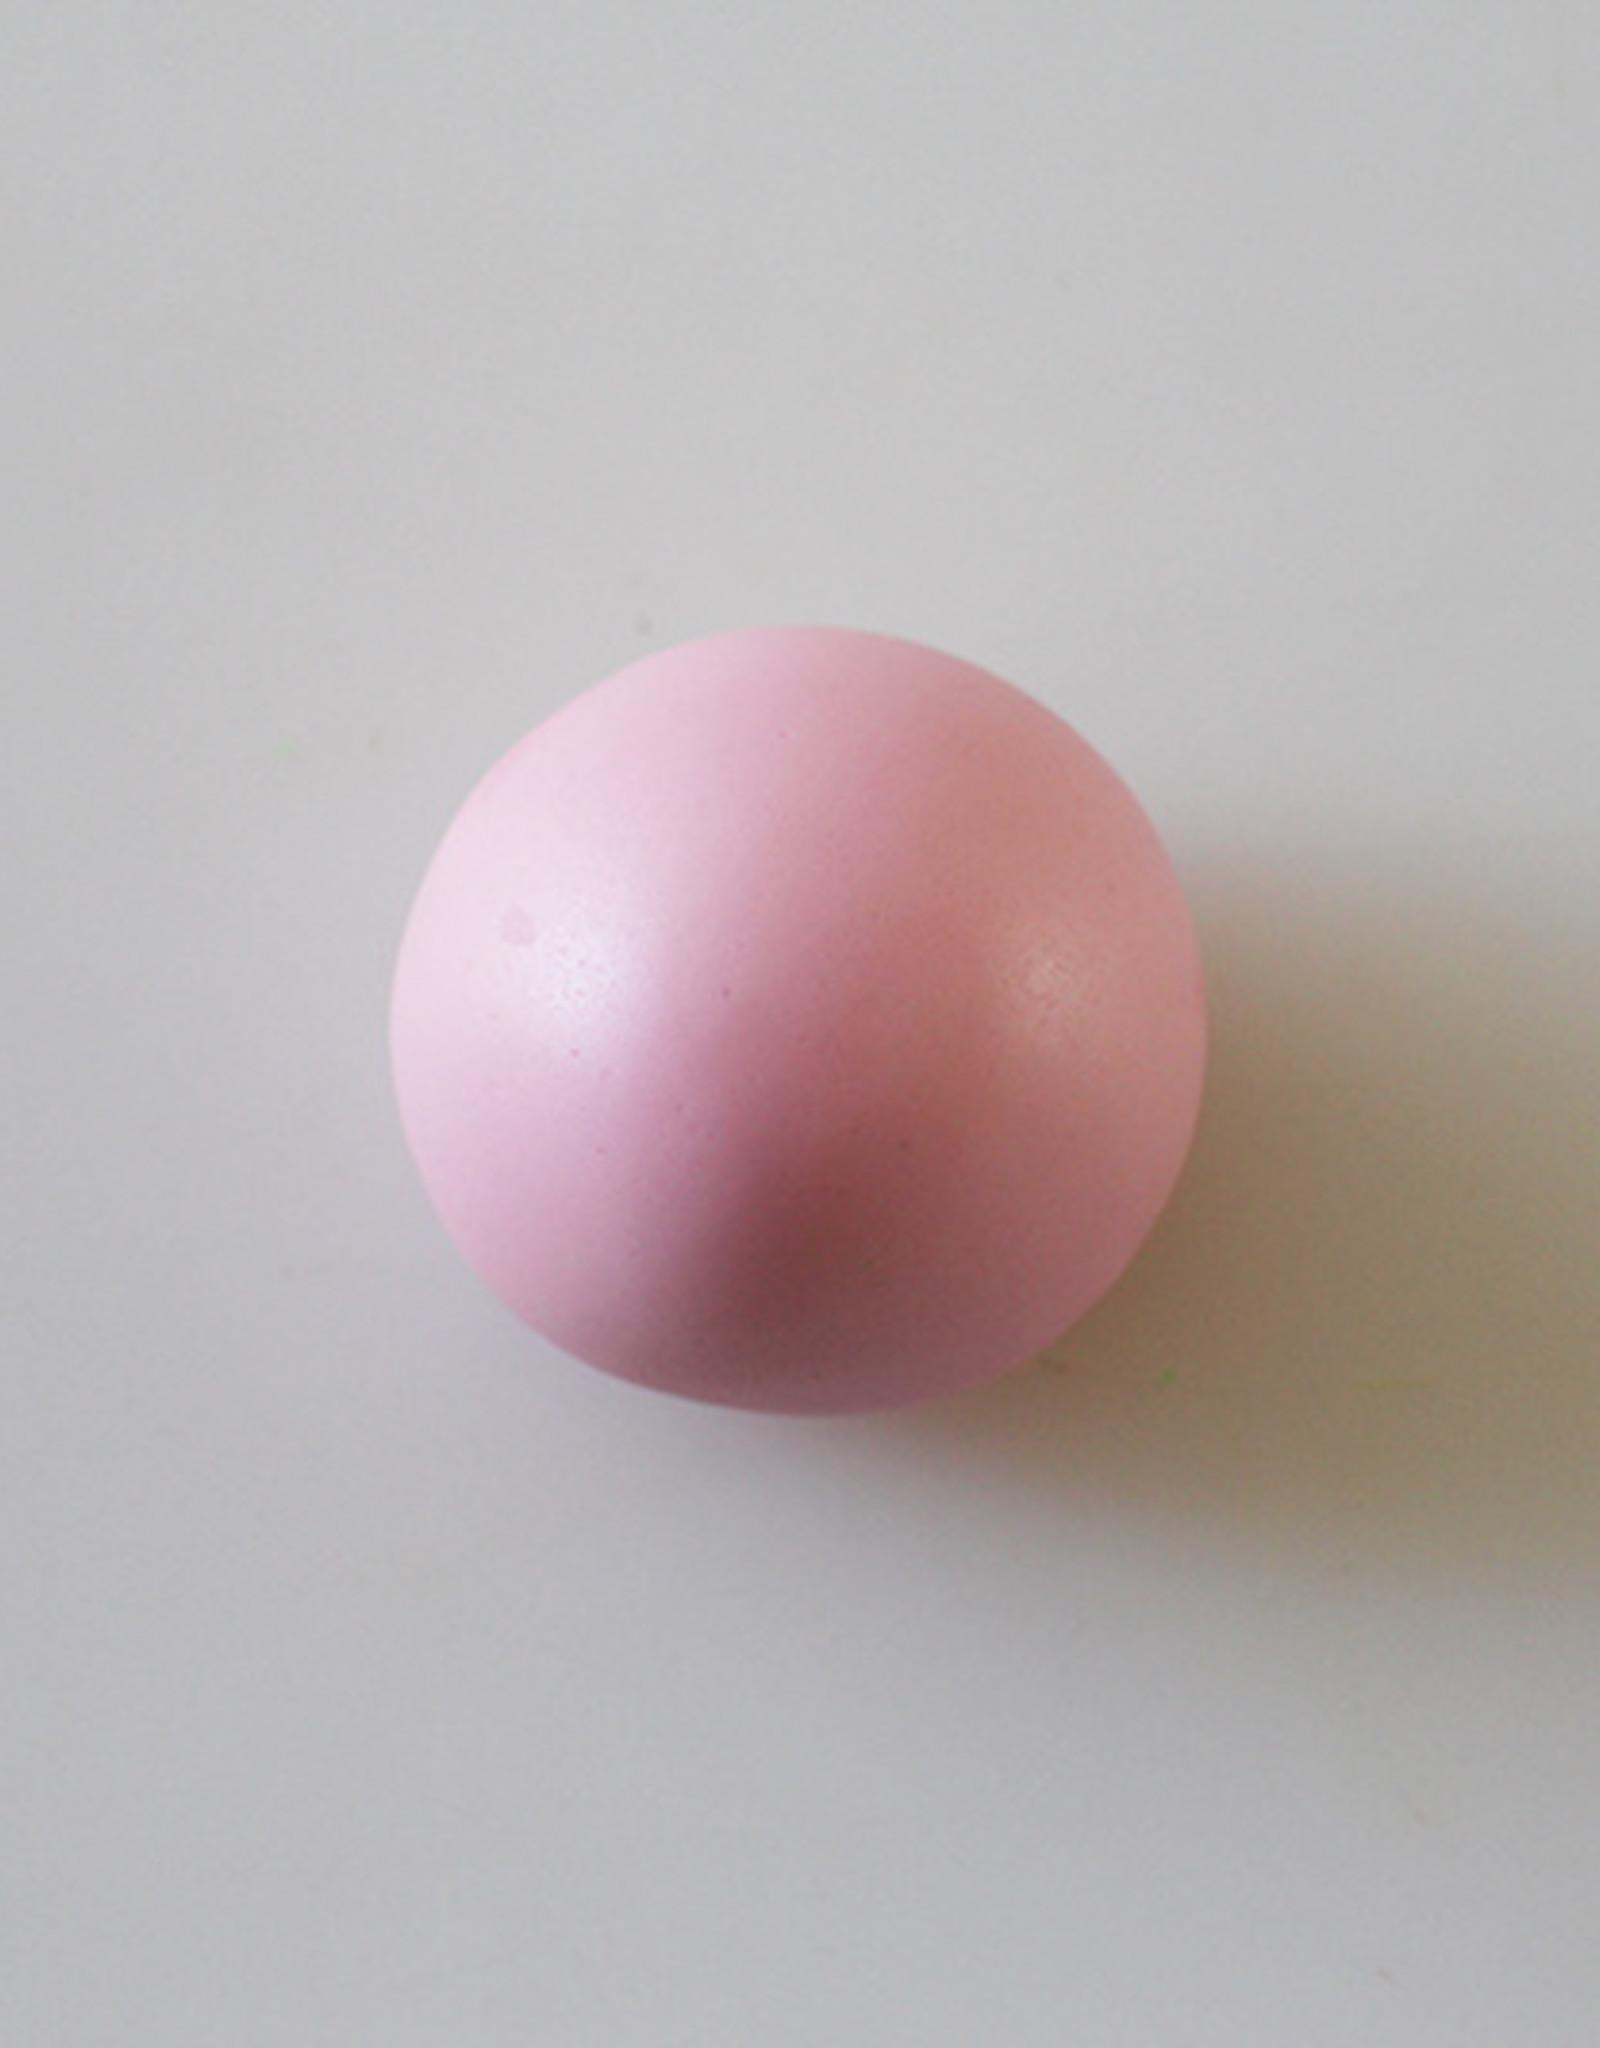 Cake Dutchess Cake Dutchess Modelling Paste Candy Pink 250g